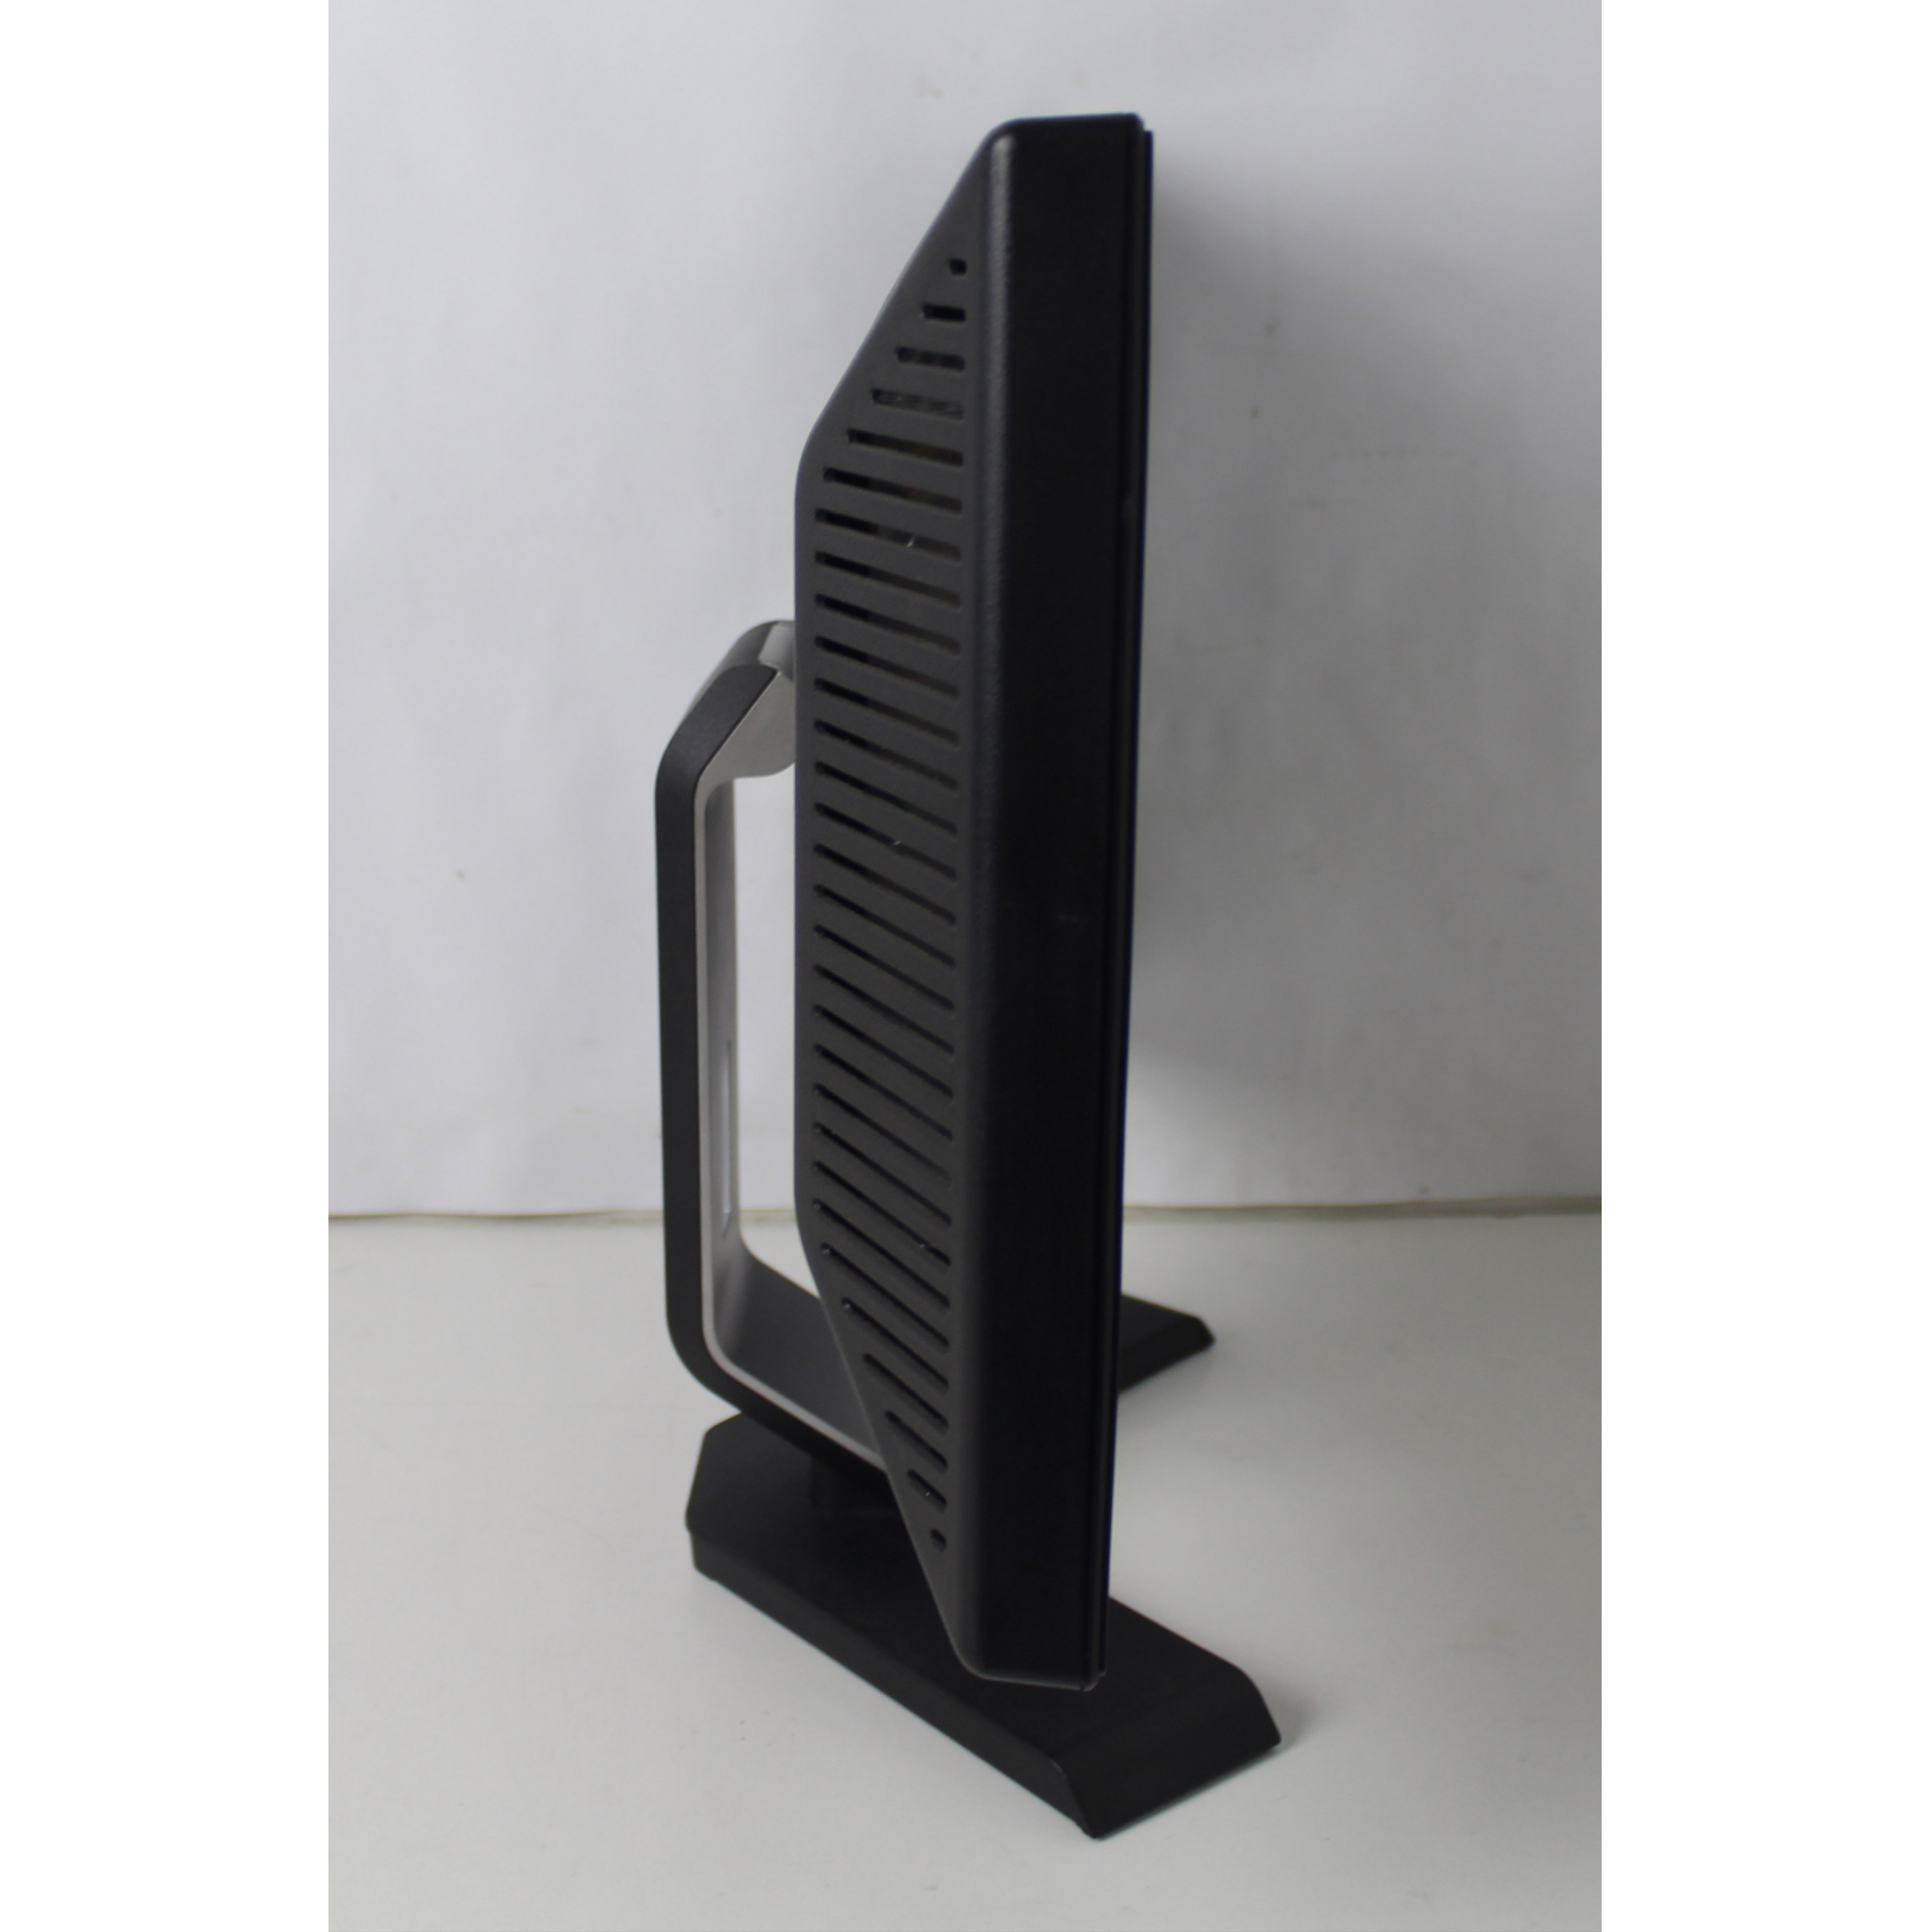 MONITOR DELL E178WFPC 17 POLEGADAS - LCD